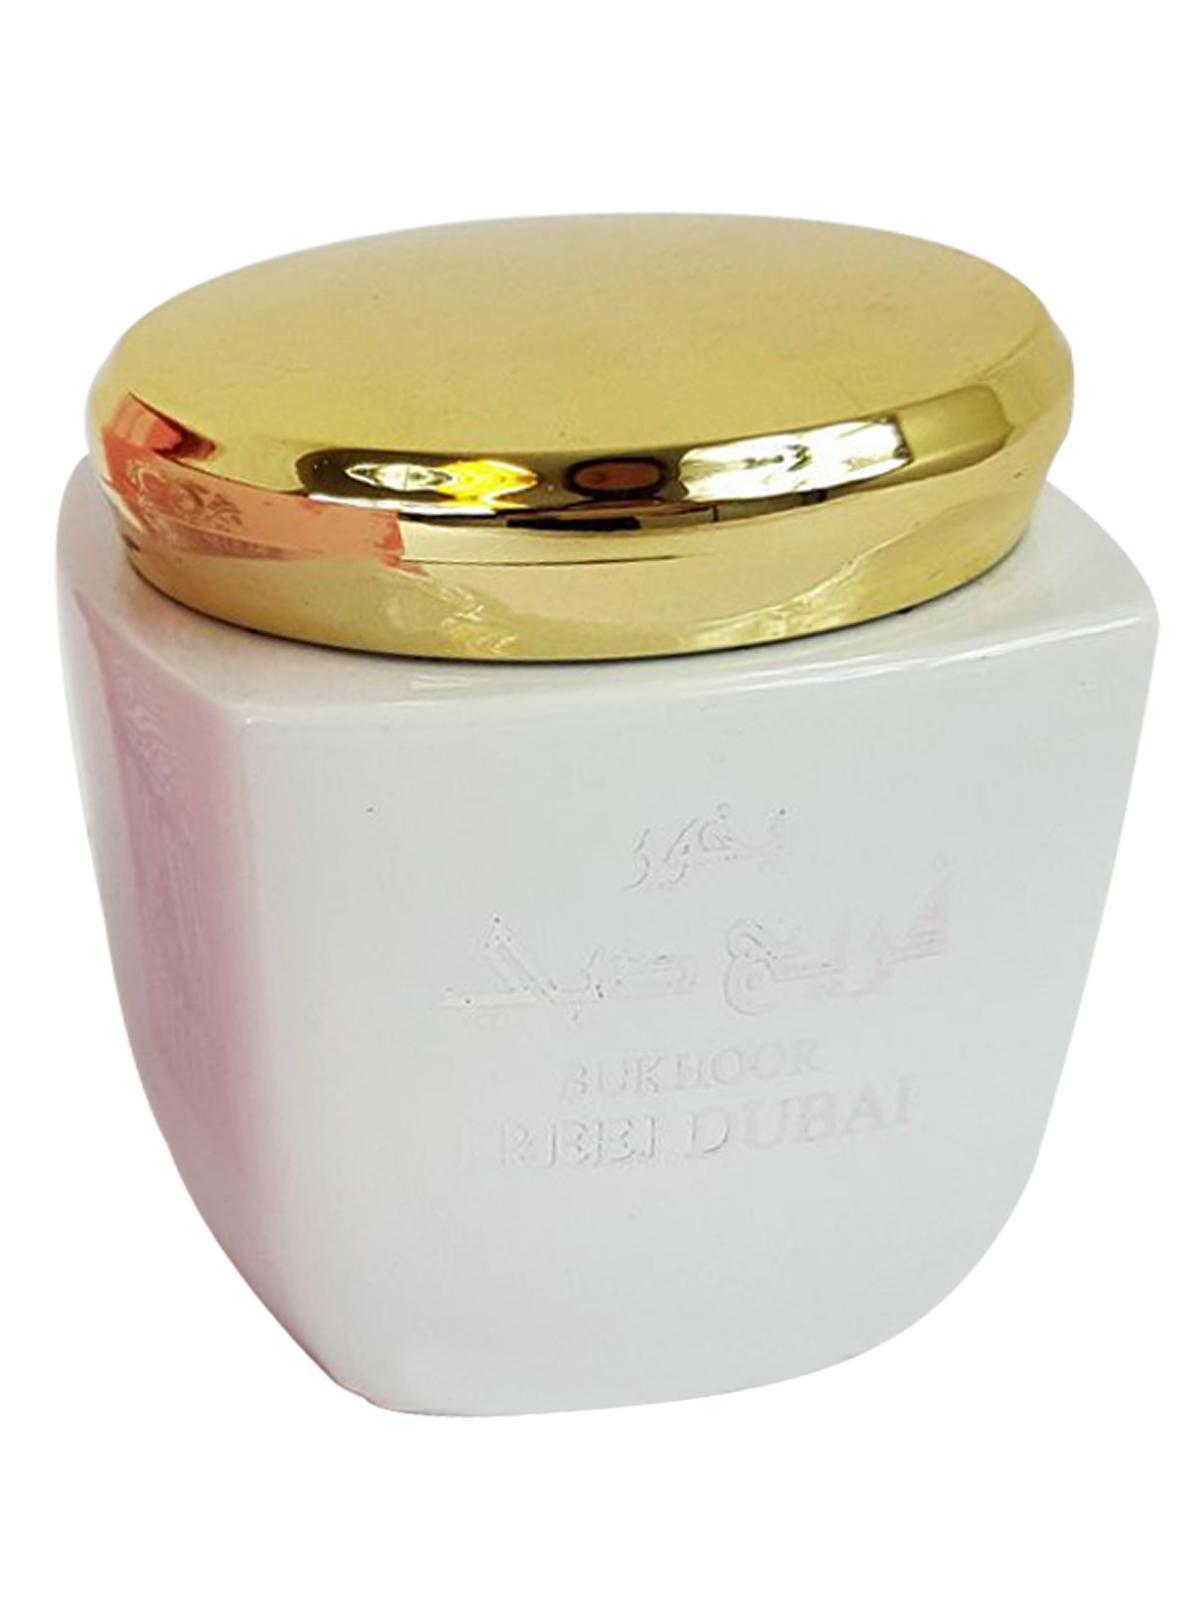 Ard Al Zaafaran Bukhoor Freej Dubai